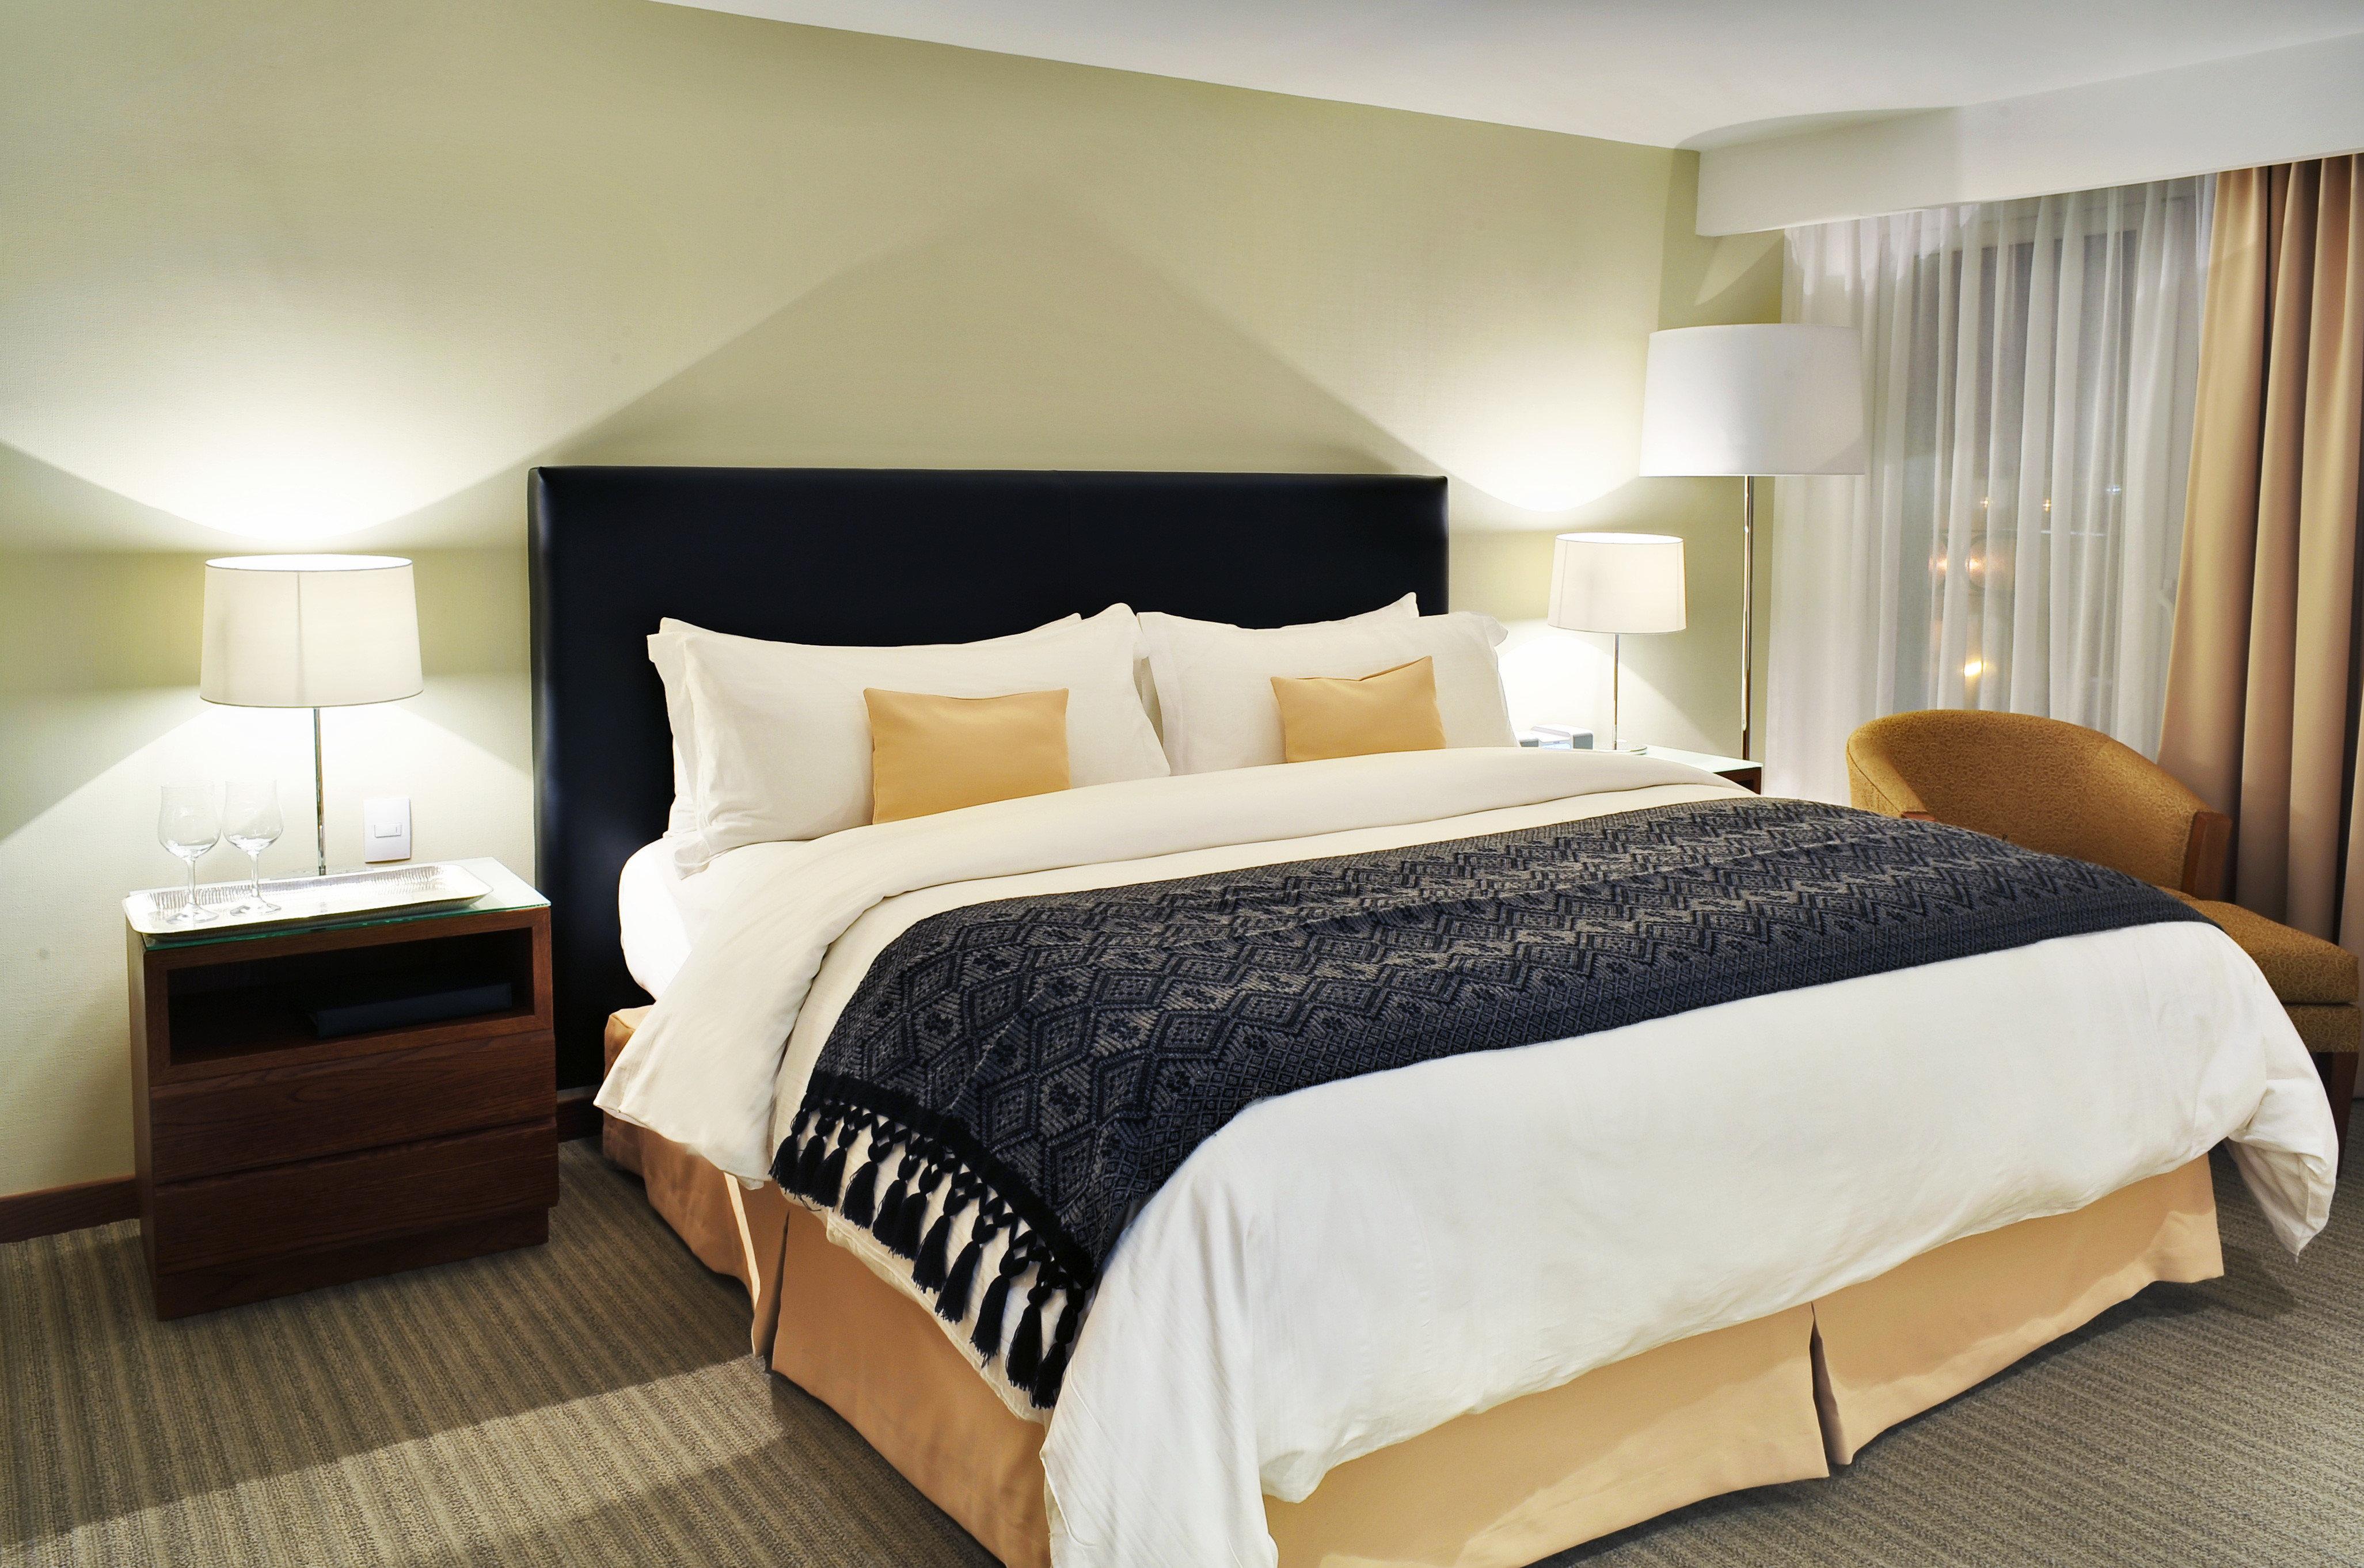 Bedroom Classic Resort property desk Suite curtain bed frame bed sheet cottage night